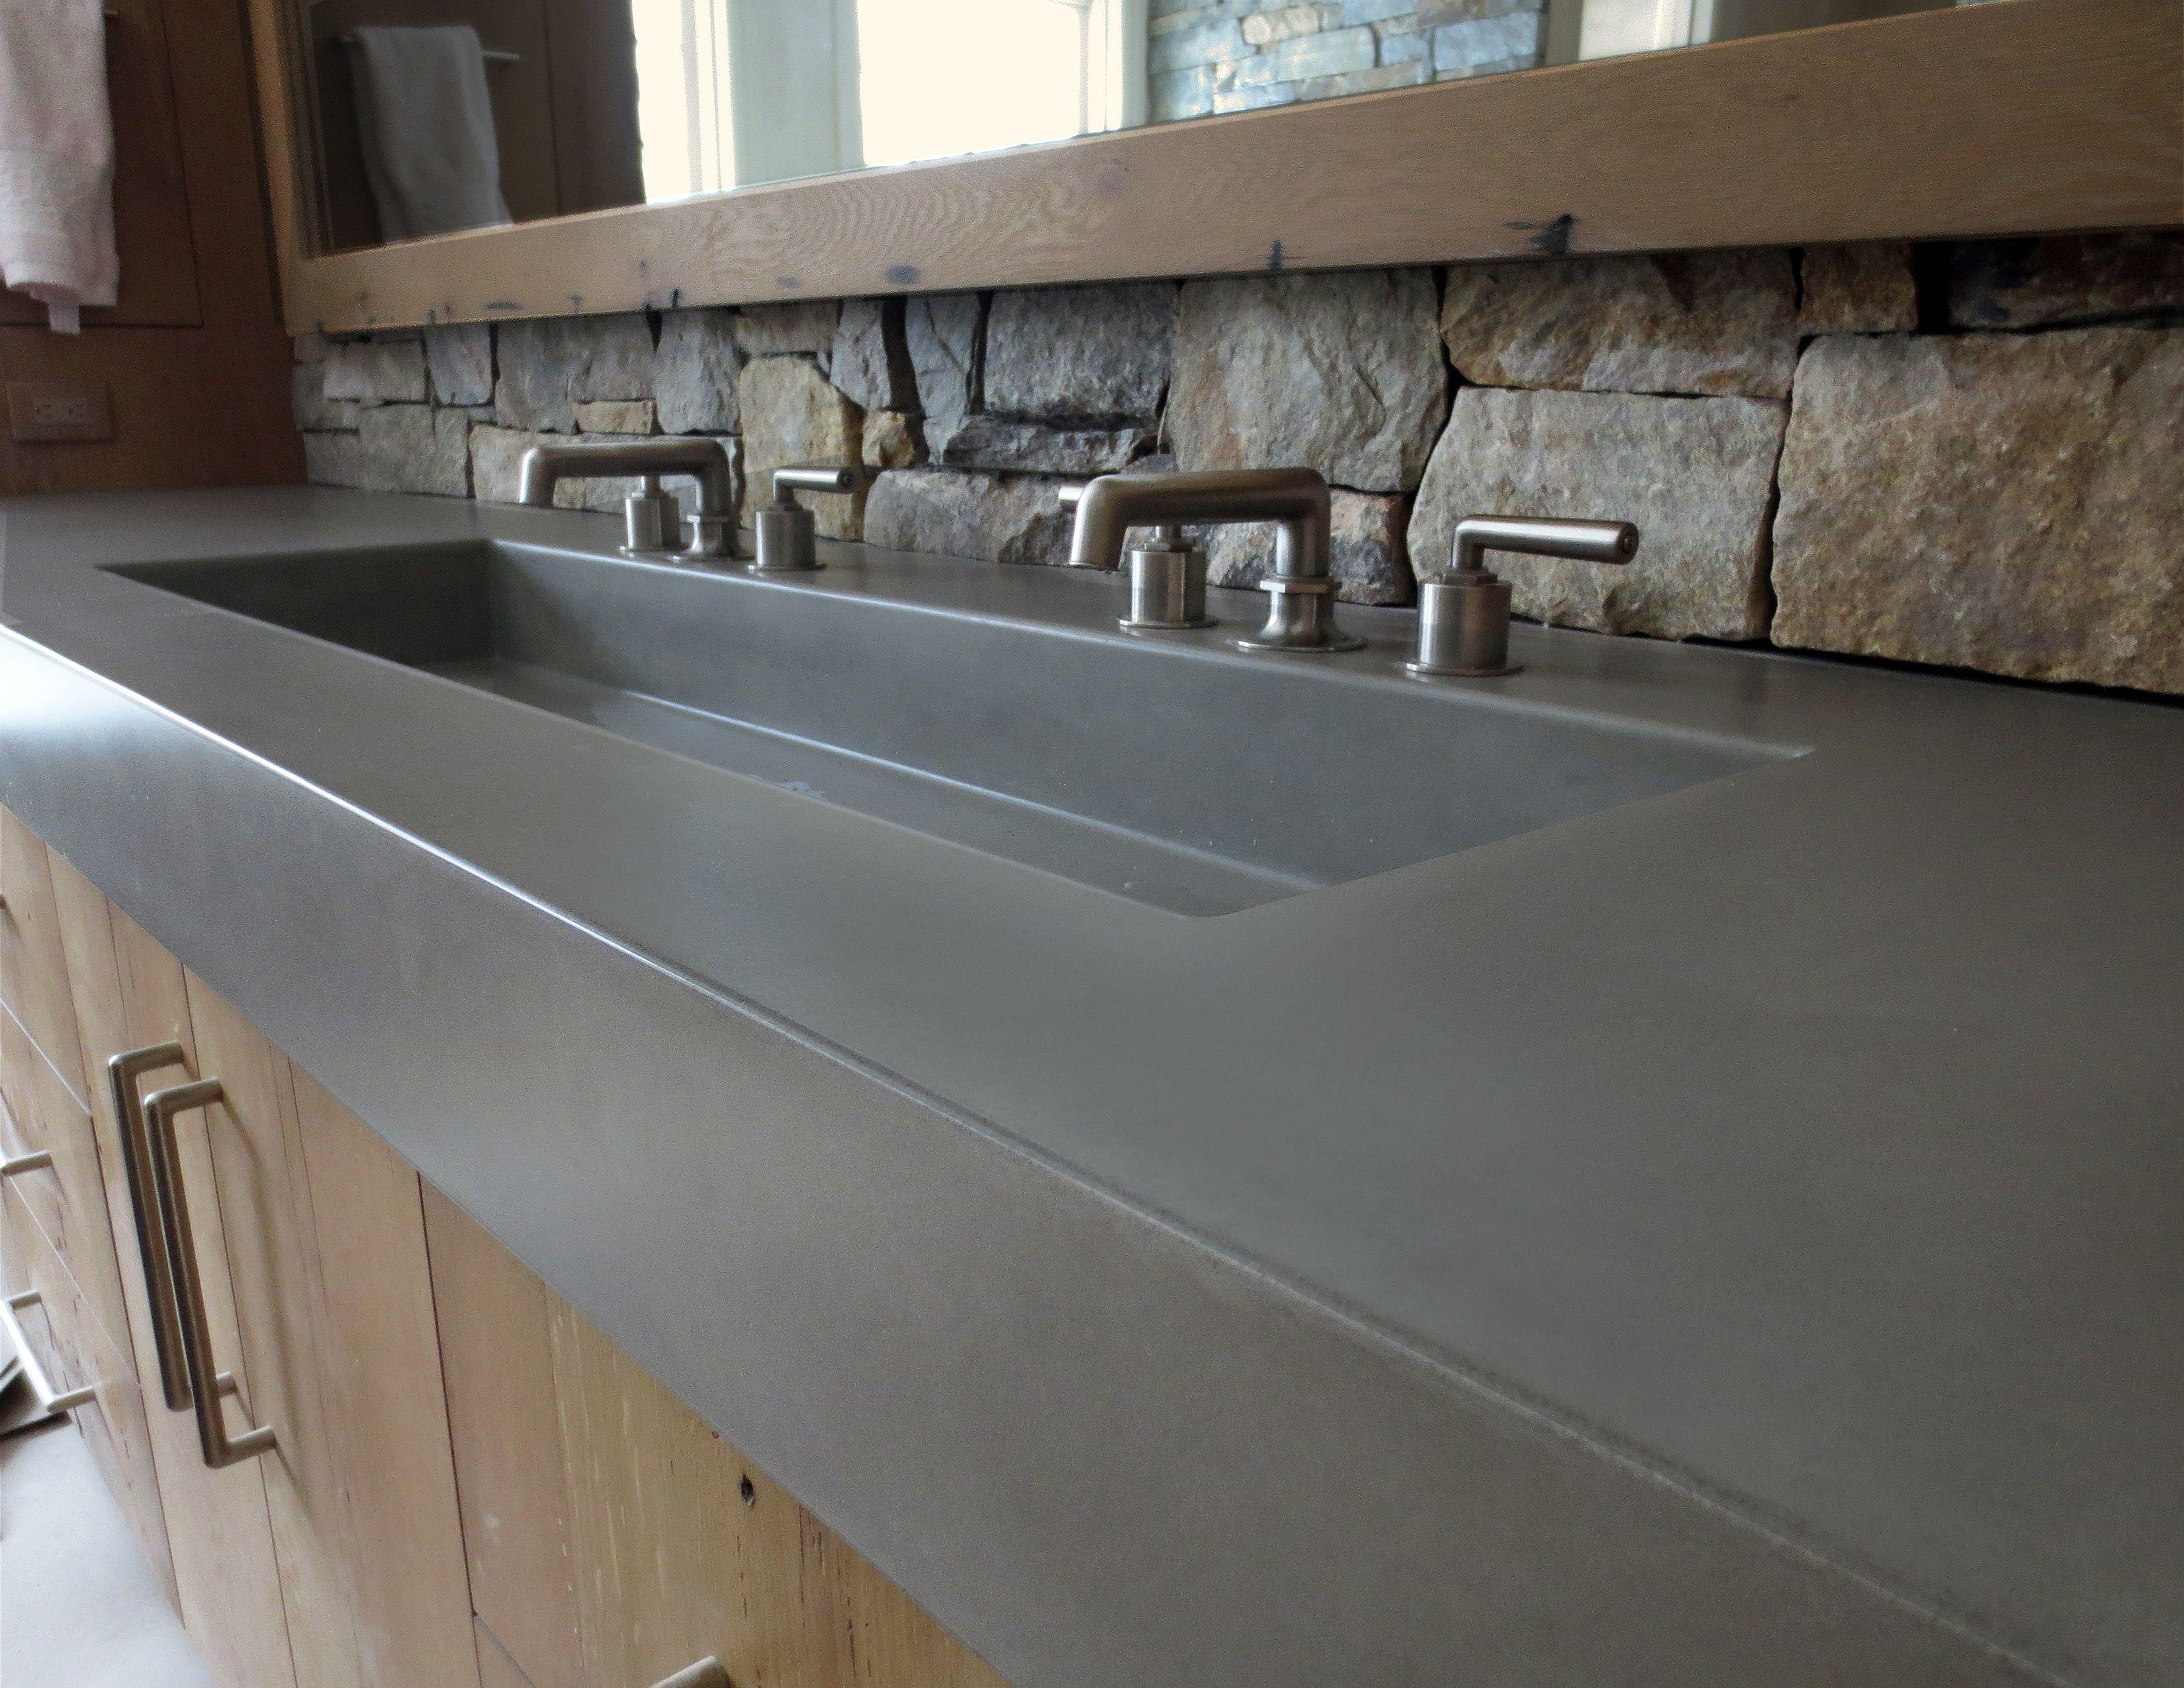 48 Rectangle Concrete Sink By Trueform Concrete Custom Concrete Vanity Top Concrete Bathroom Concrete Sink Bathrooms Remodel